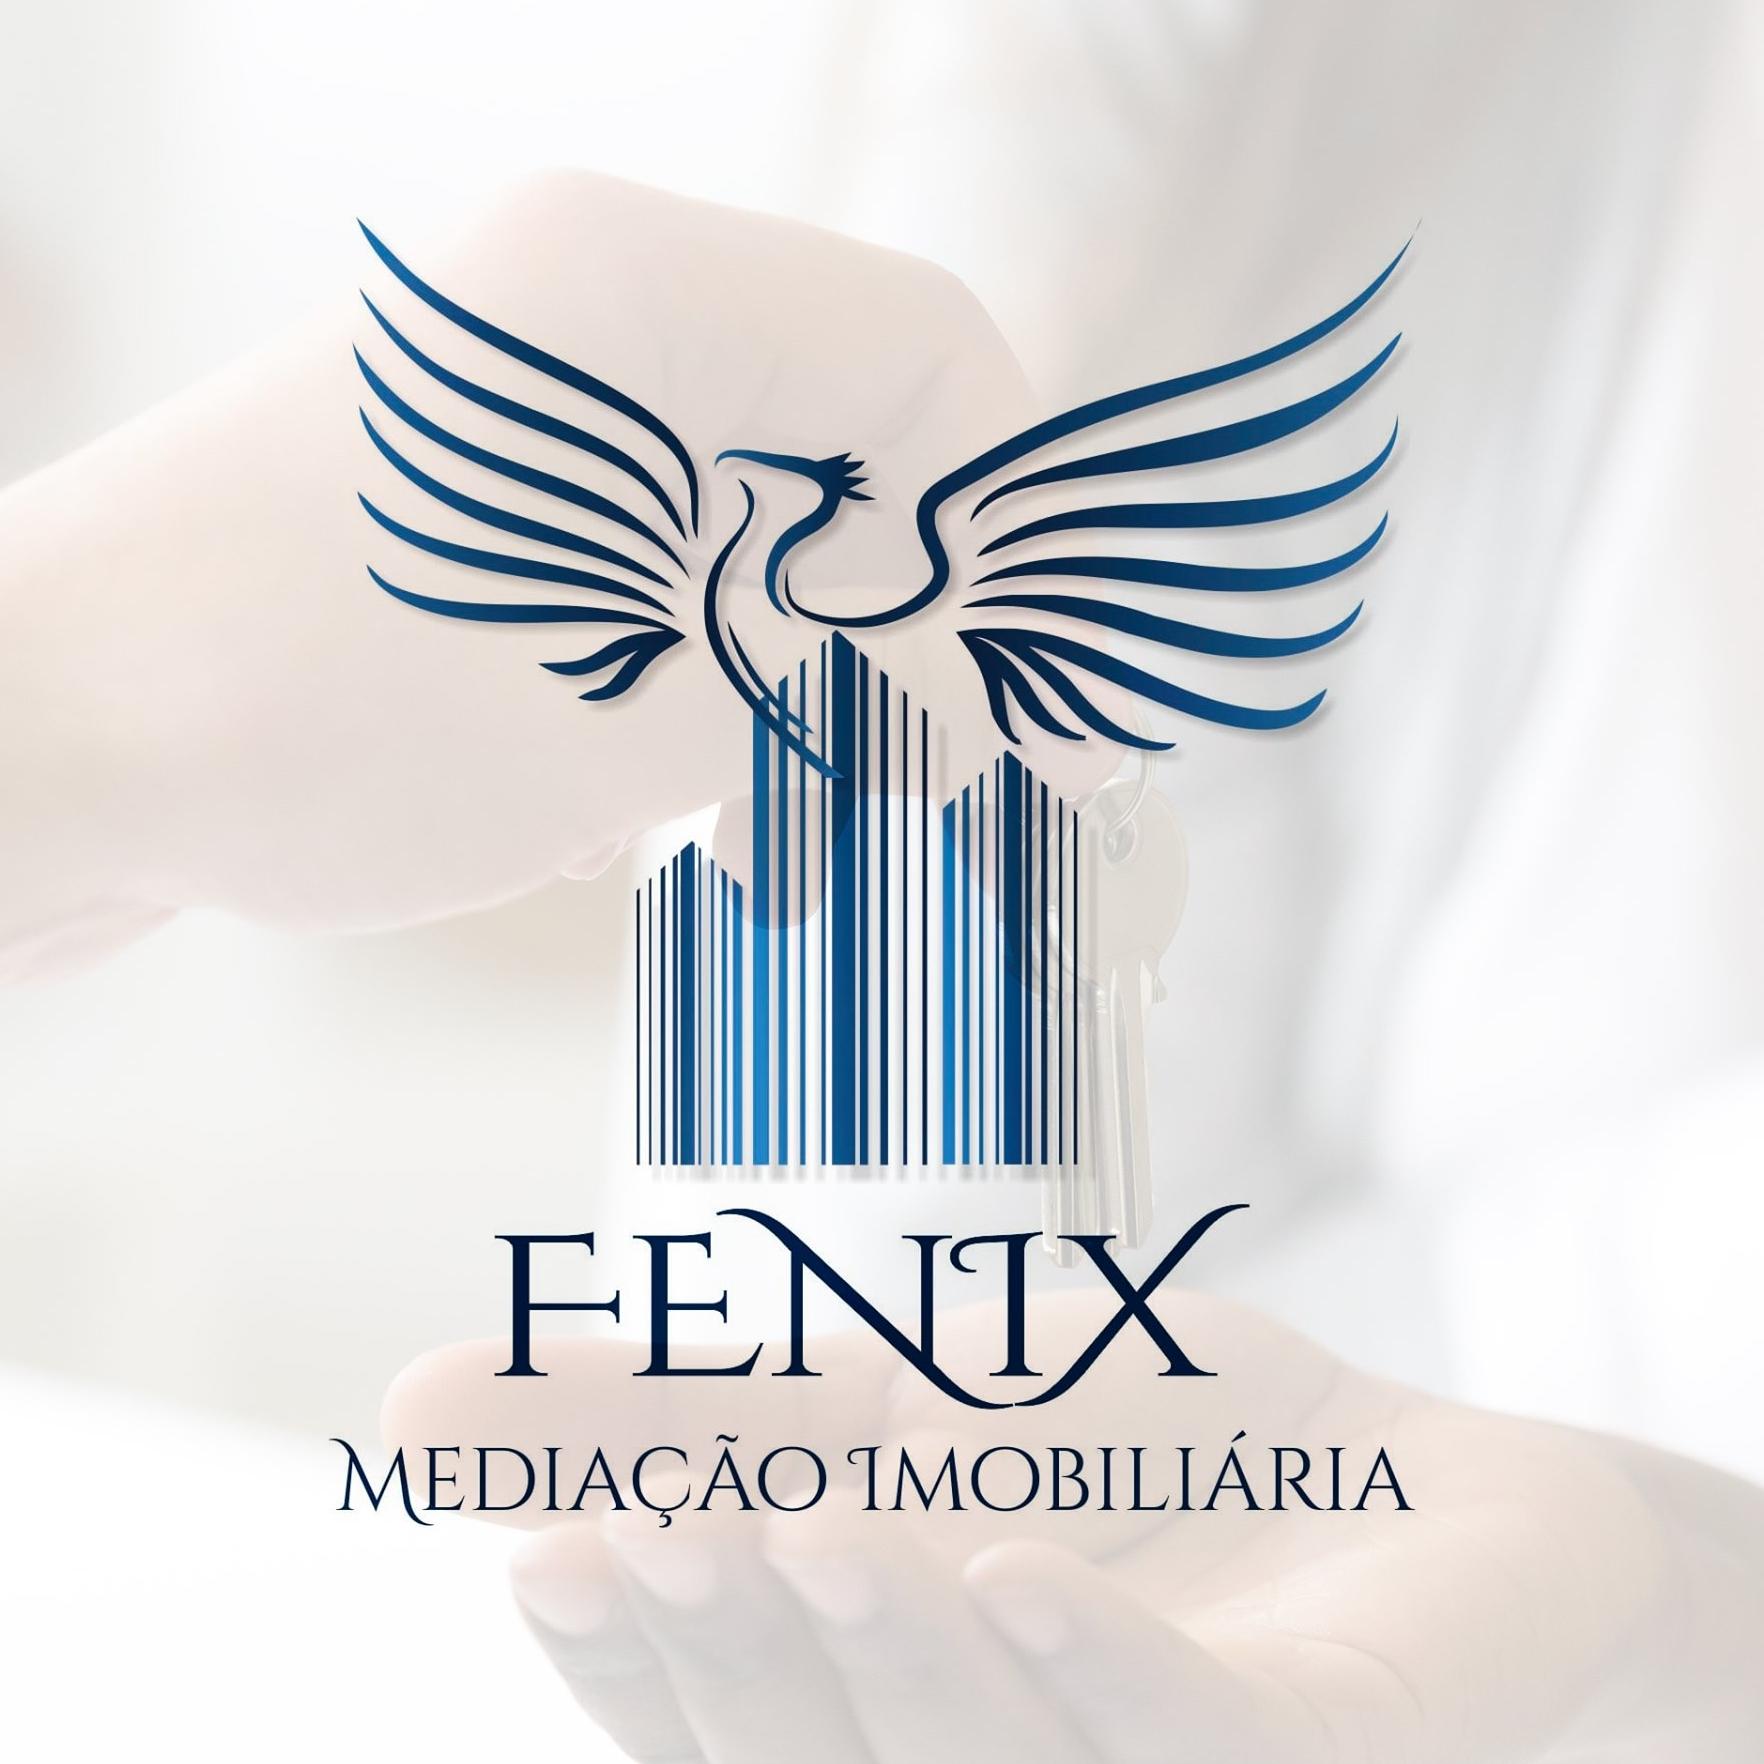 Fenix Imobiliária